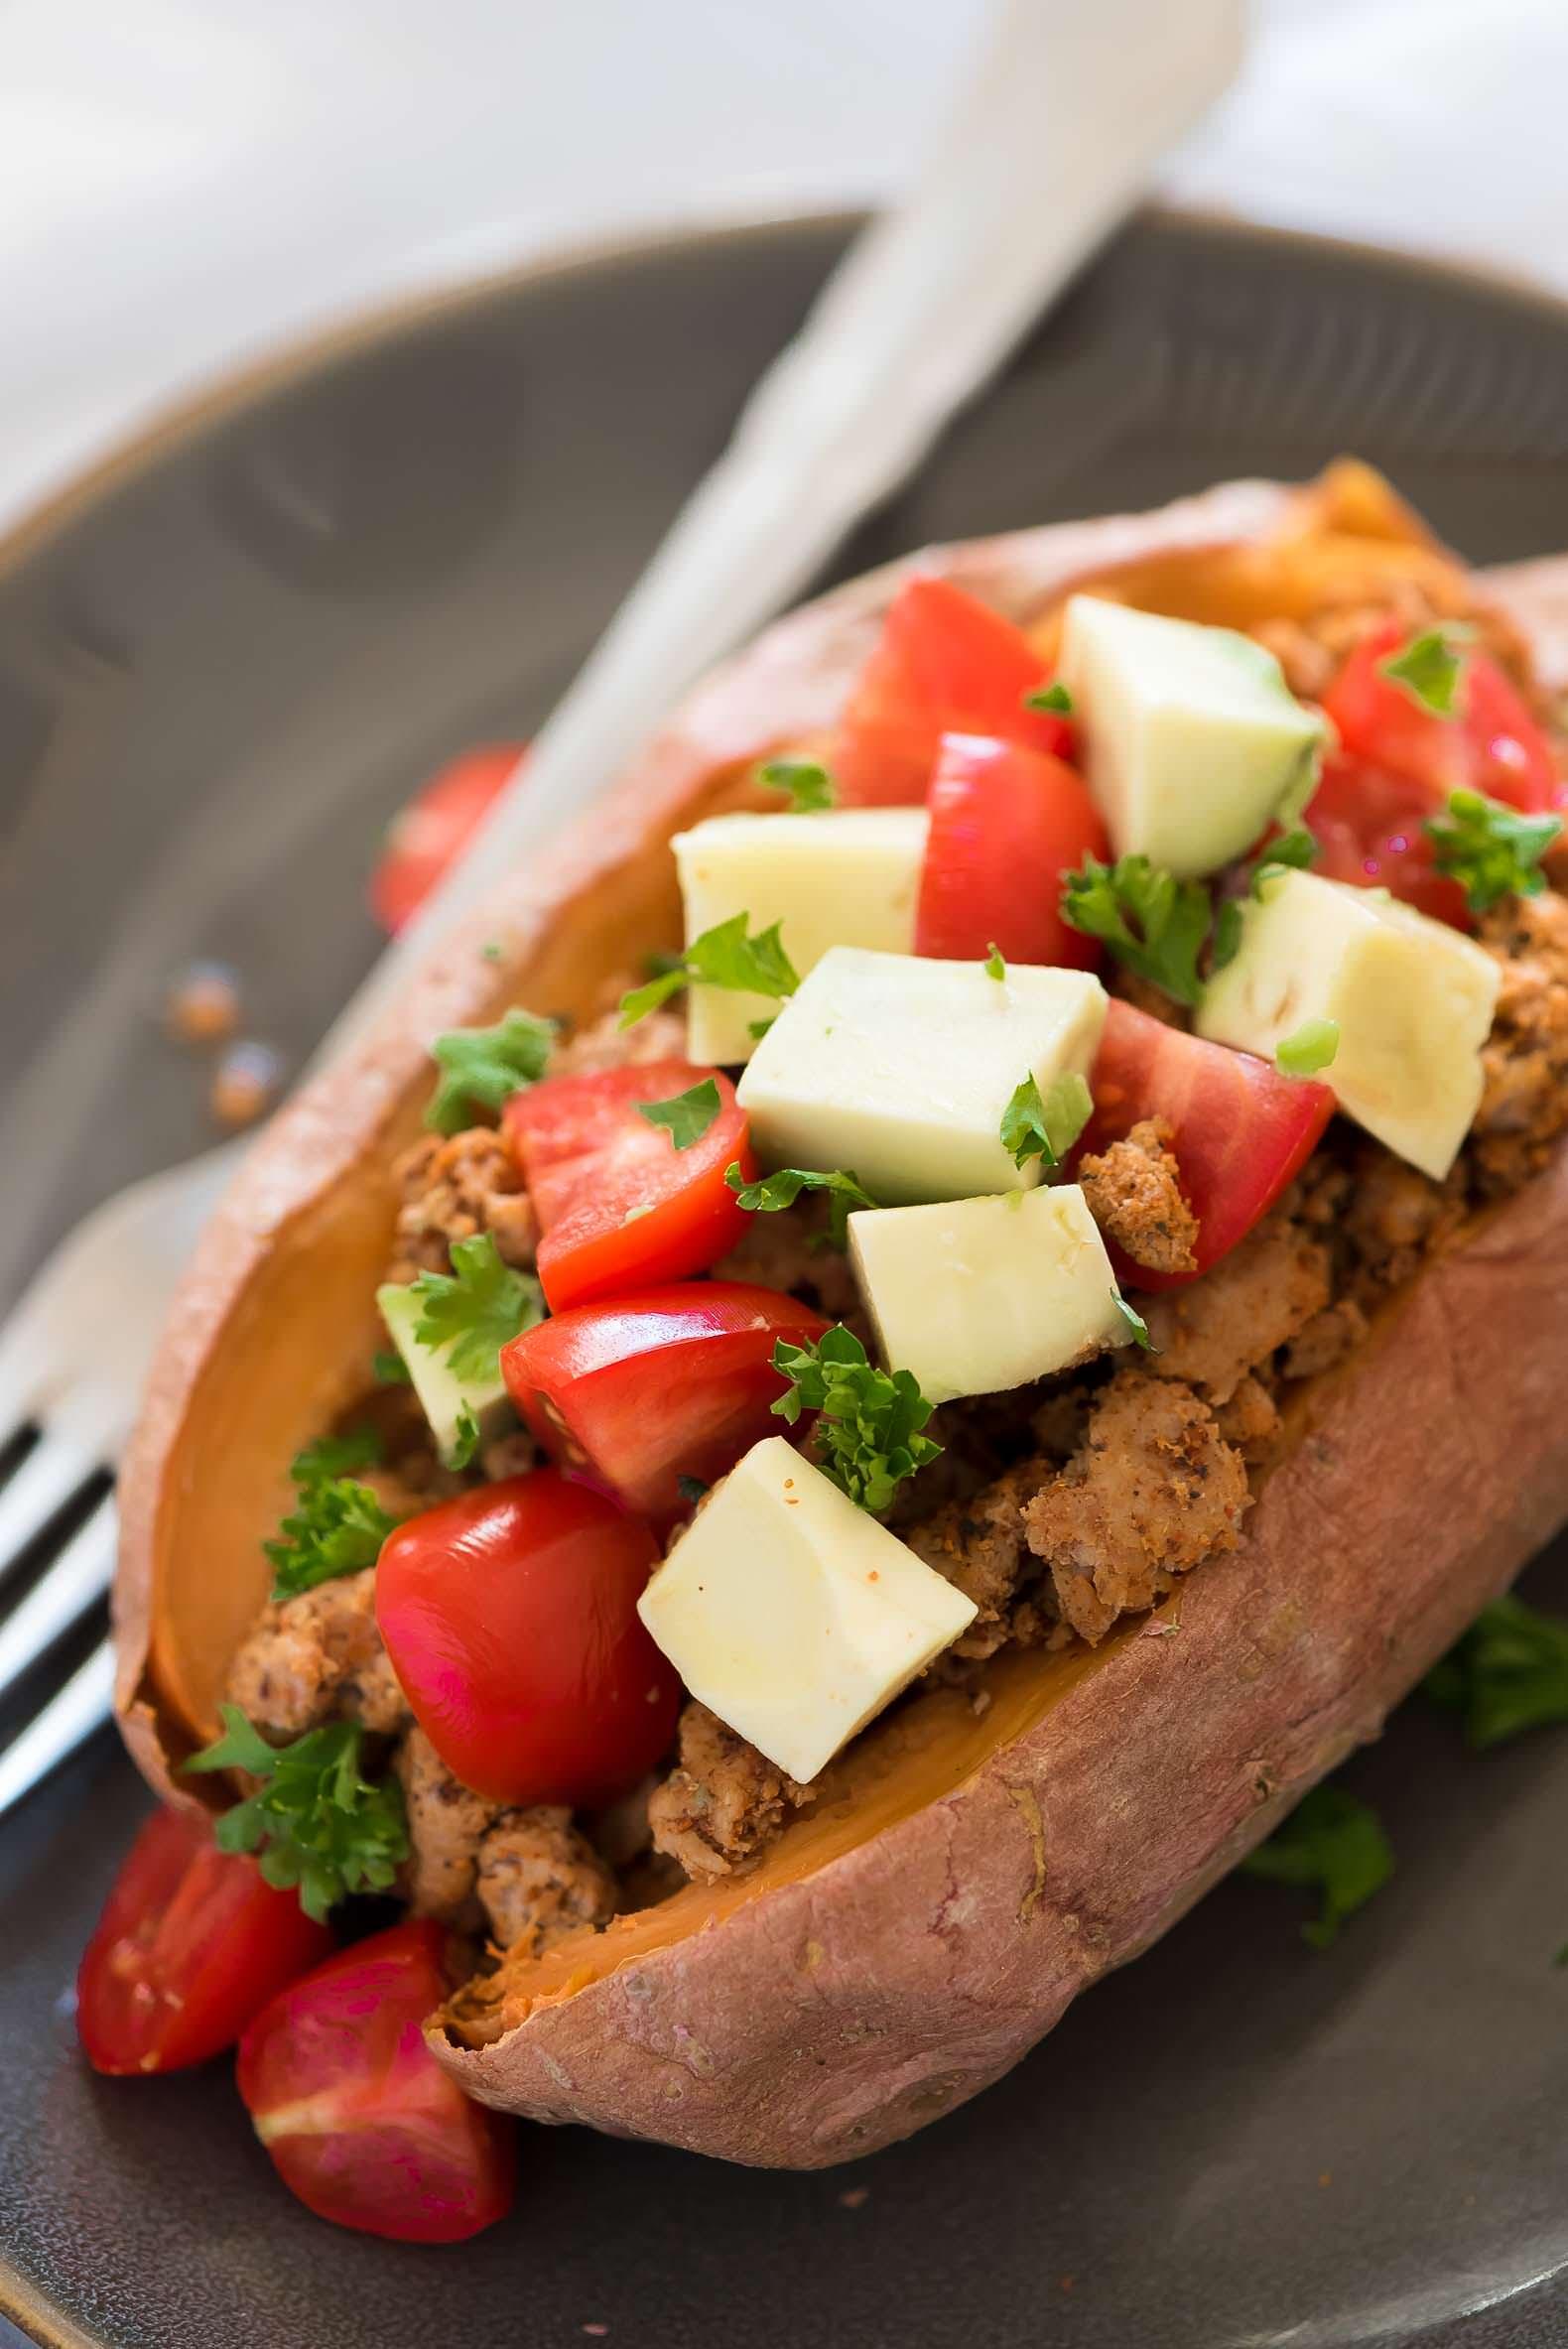 Recipe of the week - Stuffed Sweet Potato Taco